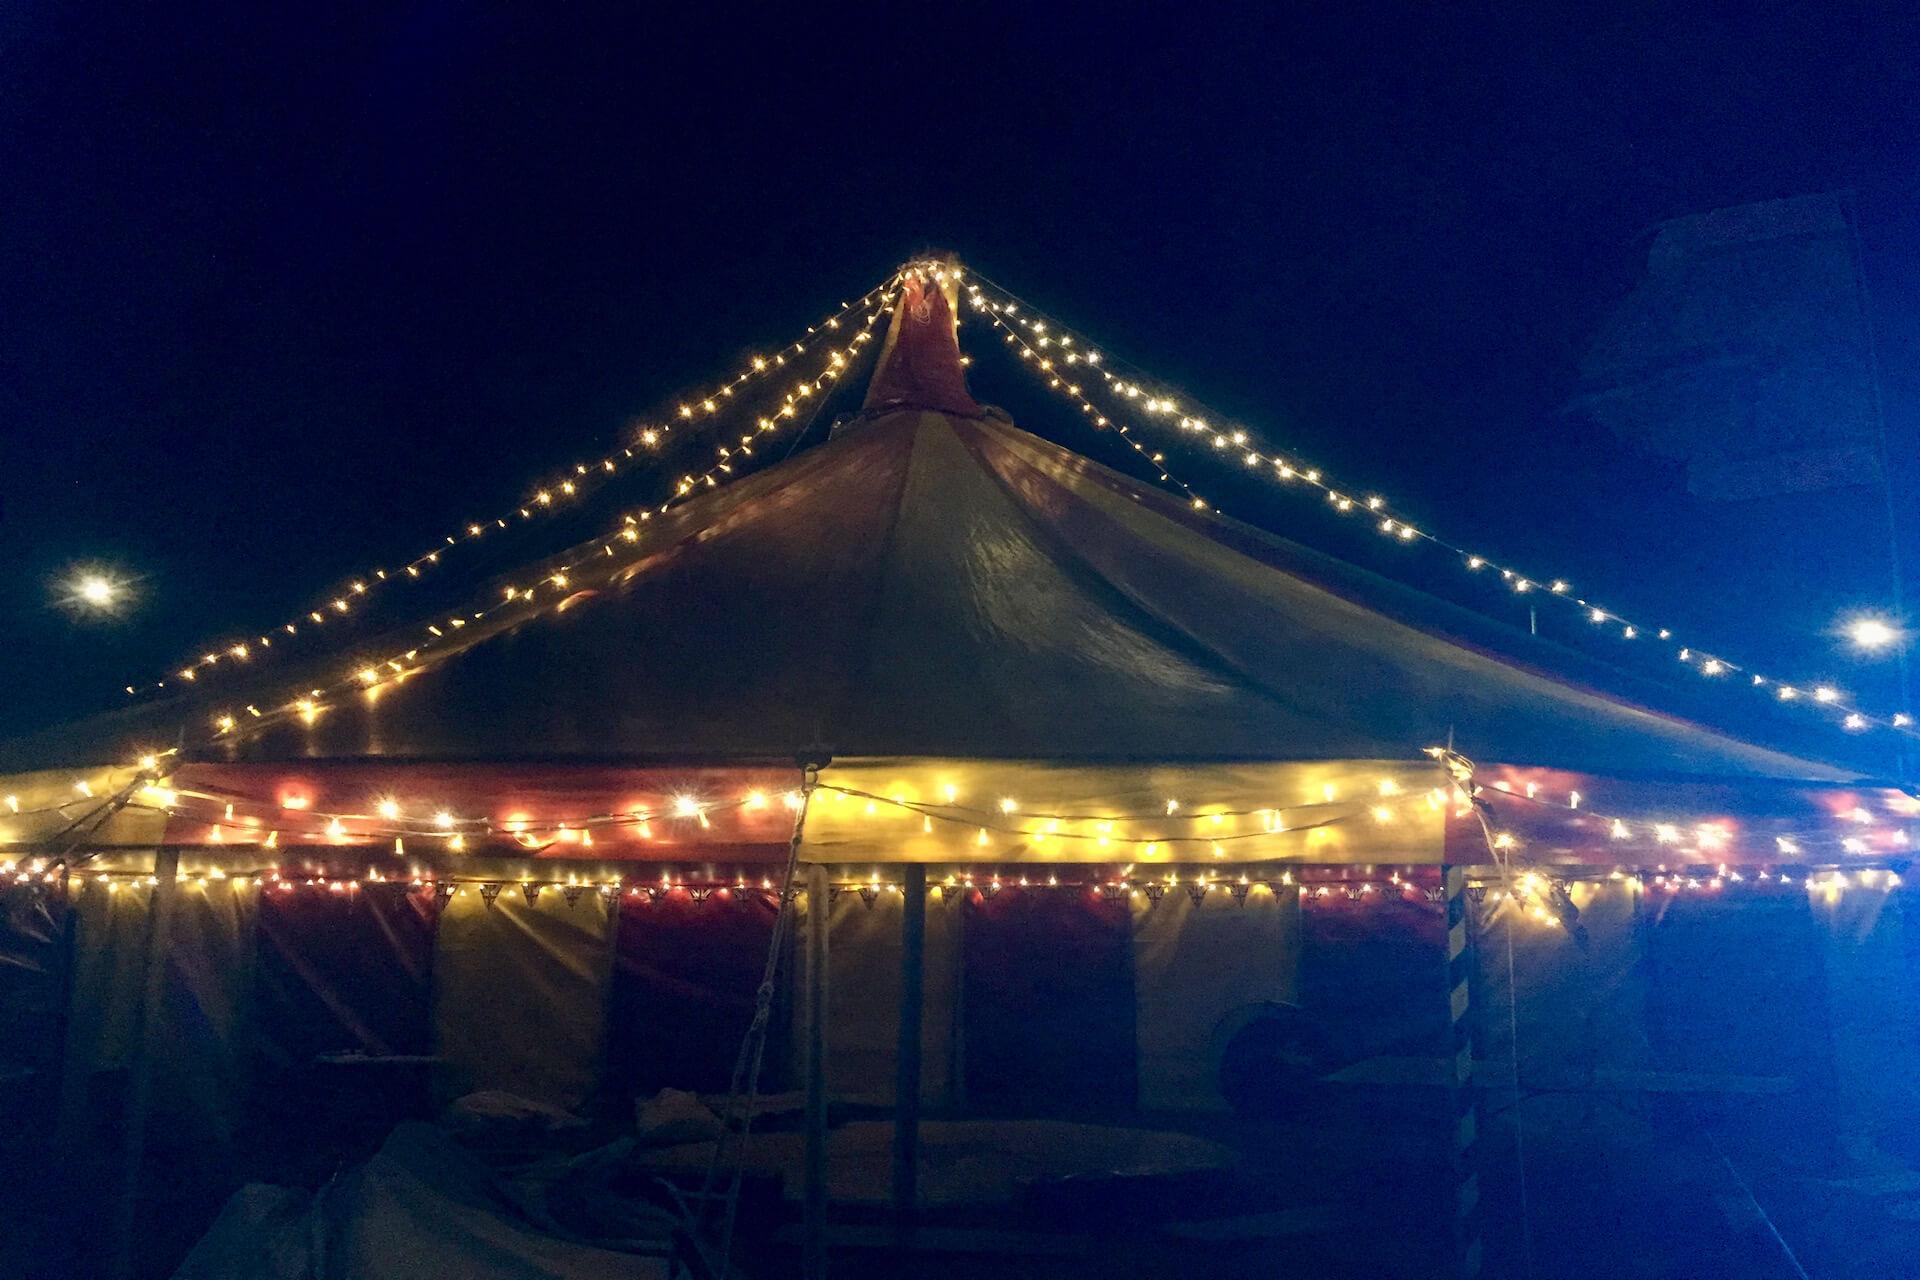 fairy lights on tent